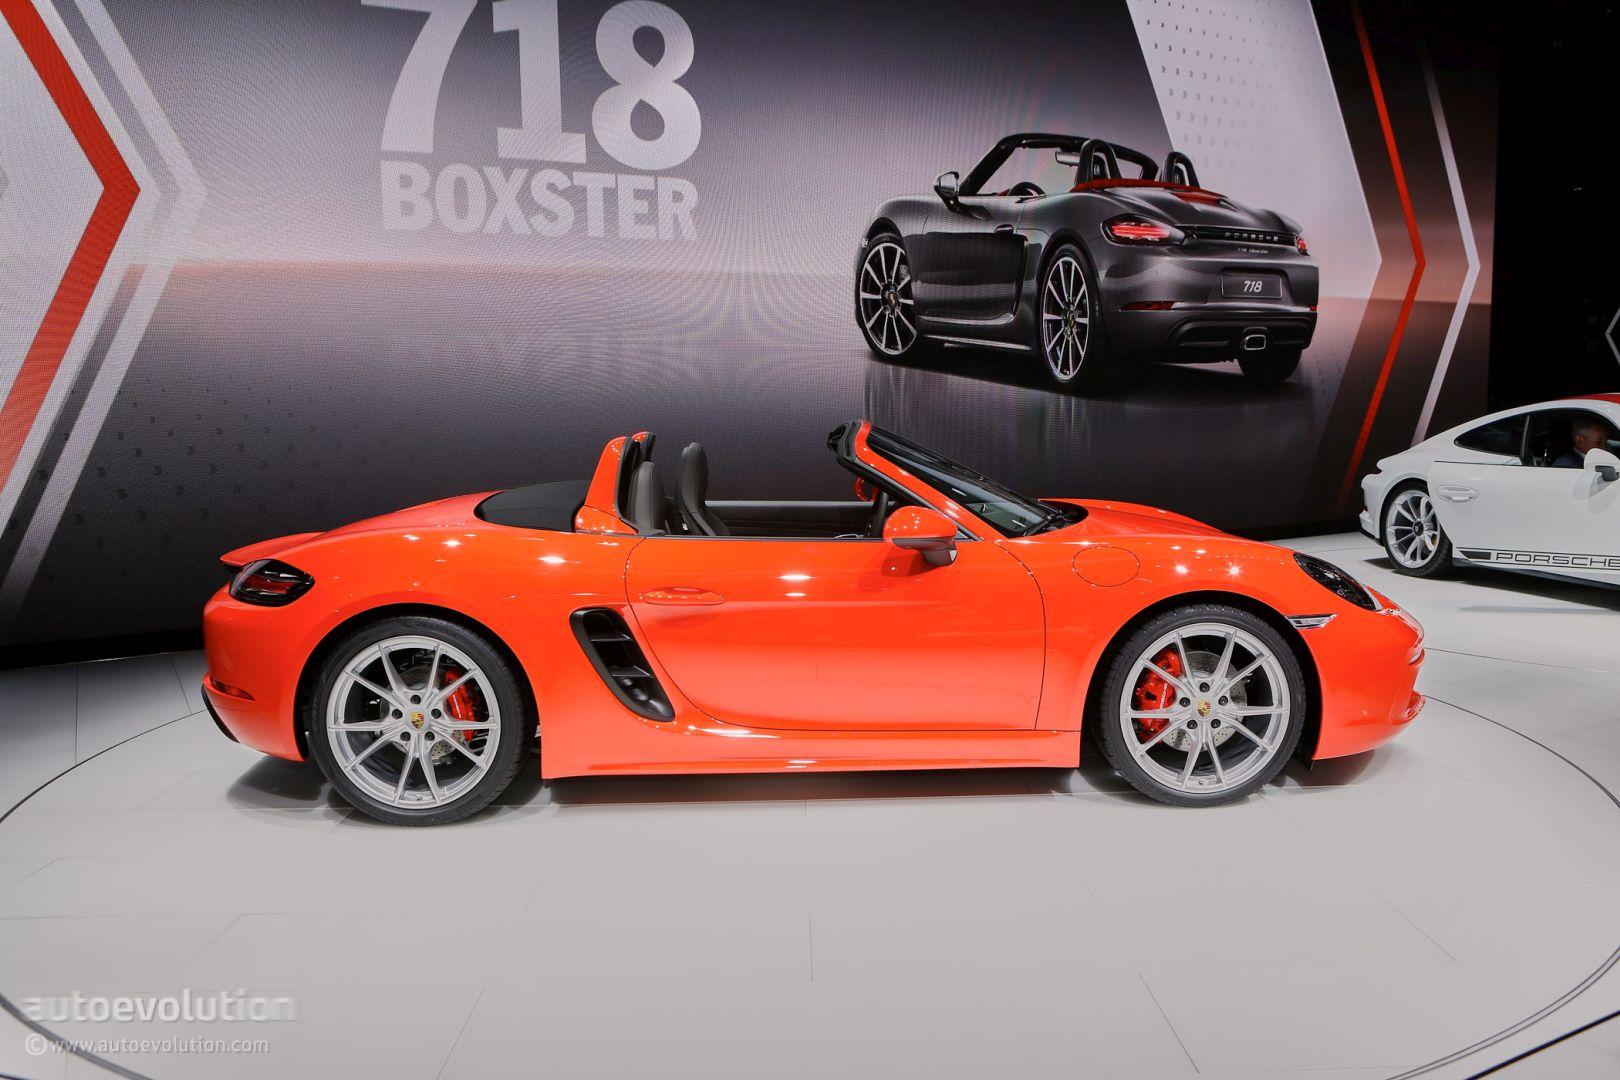 911 R For Sale >> Porsche 718 Boxster Is the Opposite of the 911 R in Geneva - autoevolution